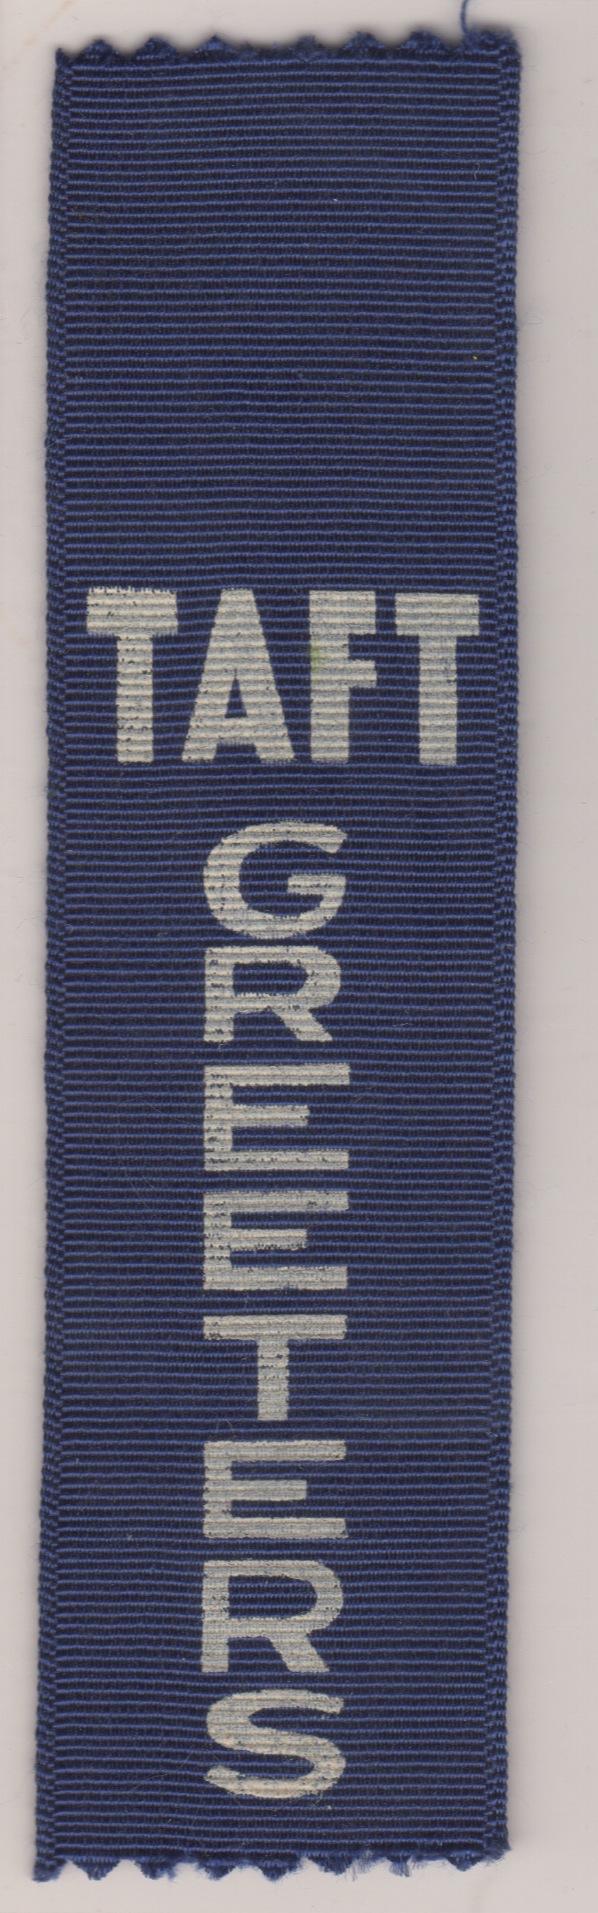 OHPres1952-59 TAFT.jpeg